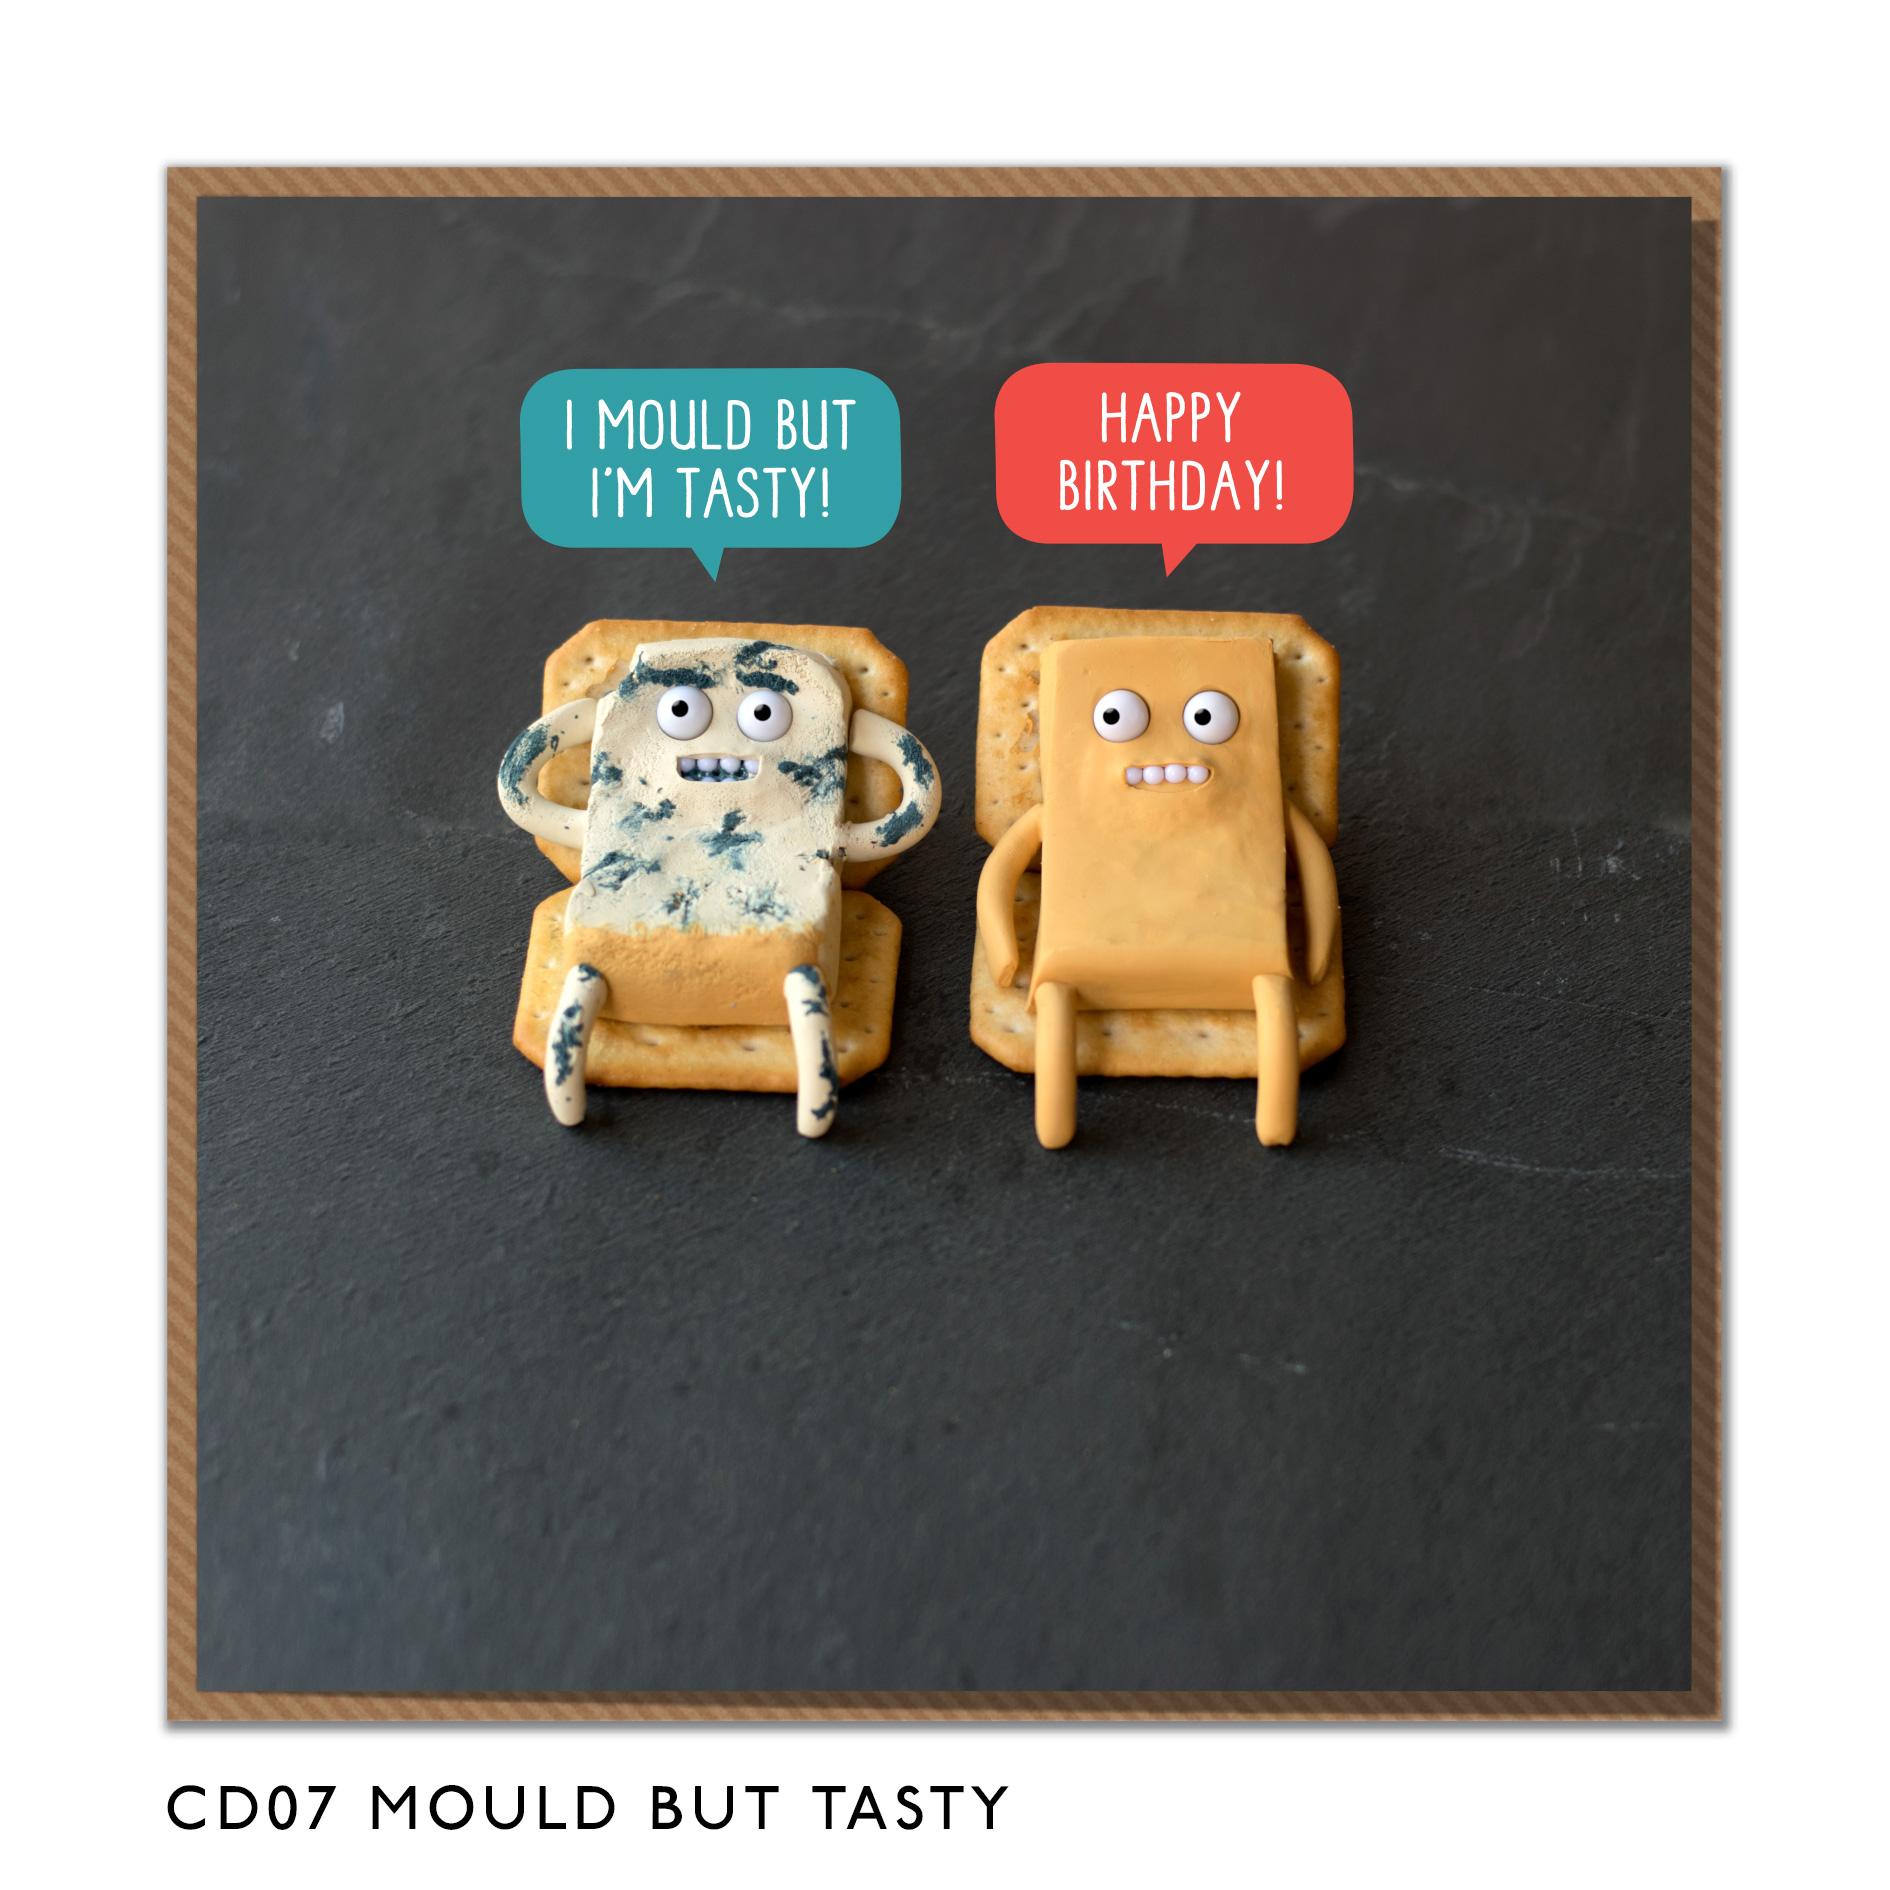 CD07-MOULD-BUT-TASTY.jpg